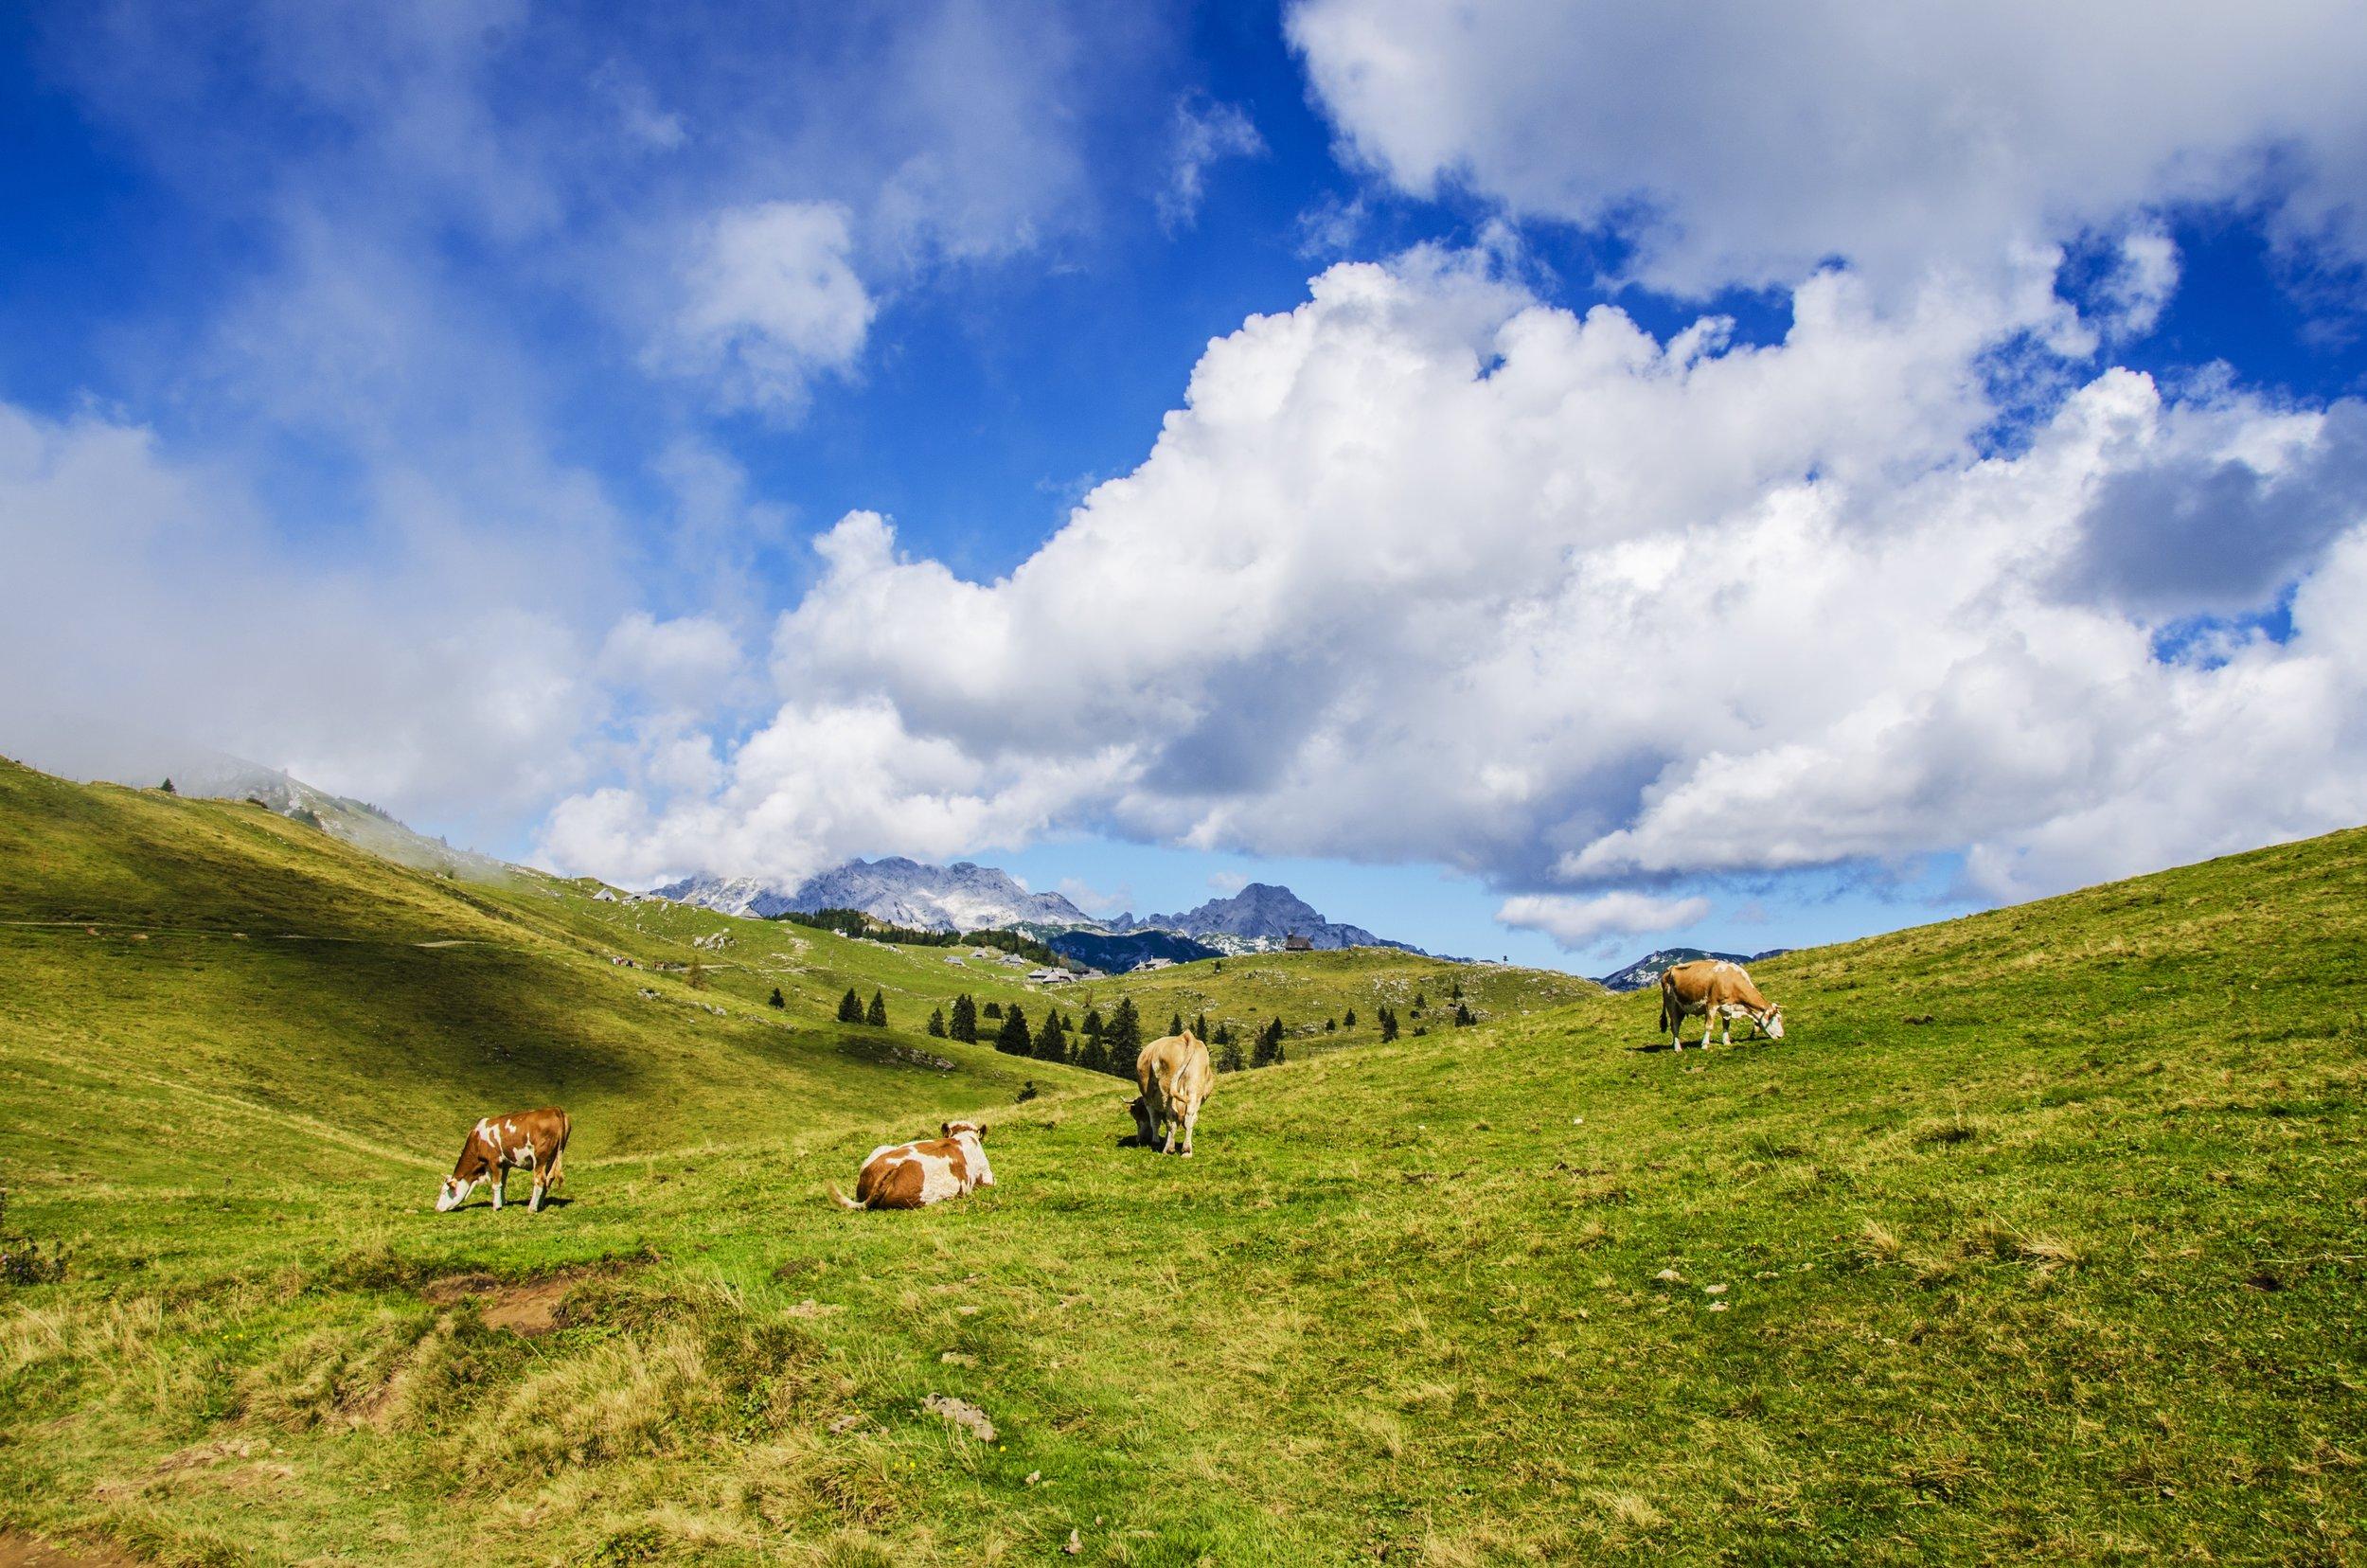 Cows grazing in green farm